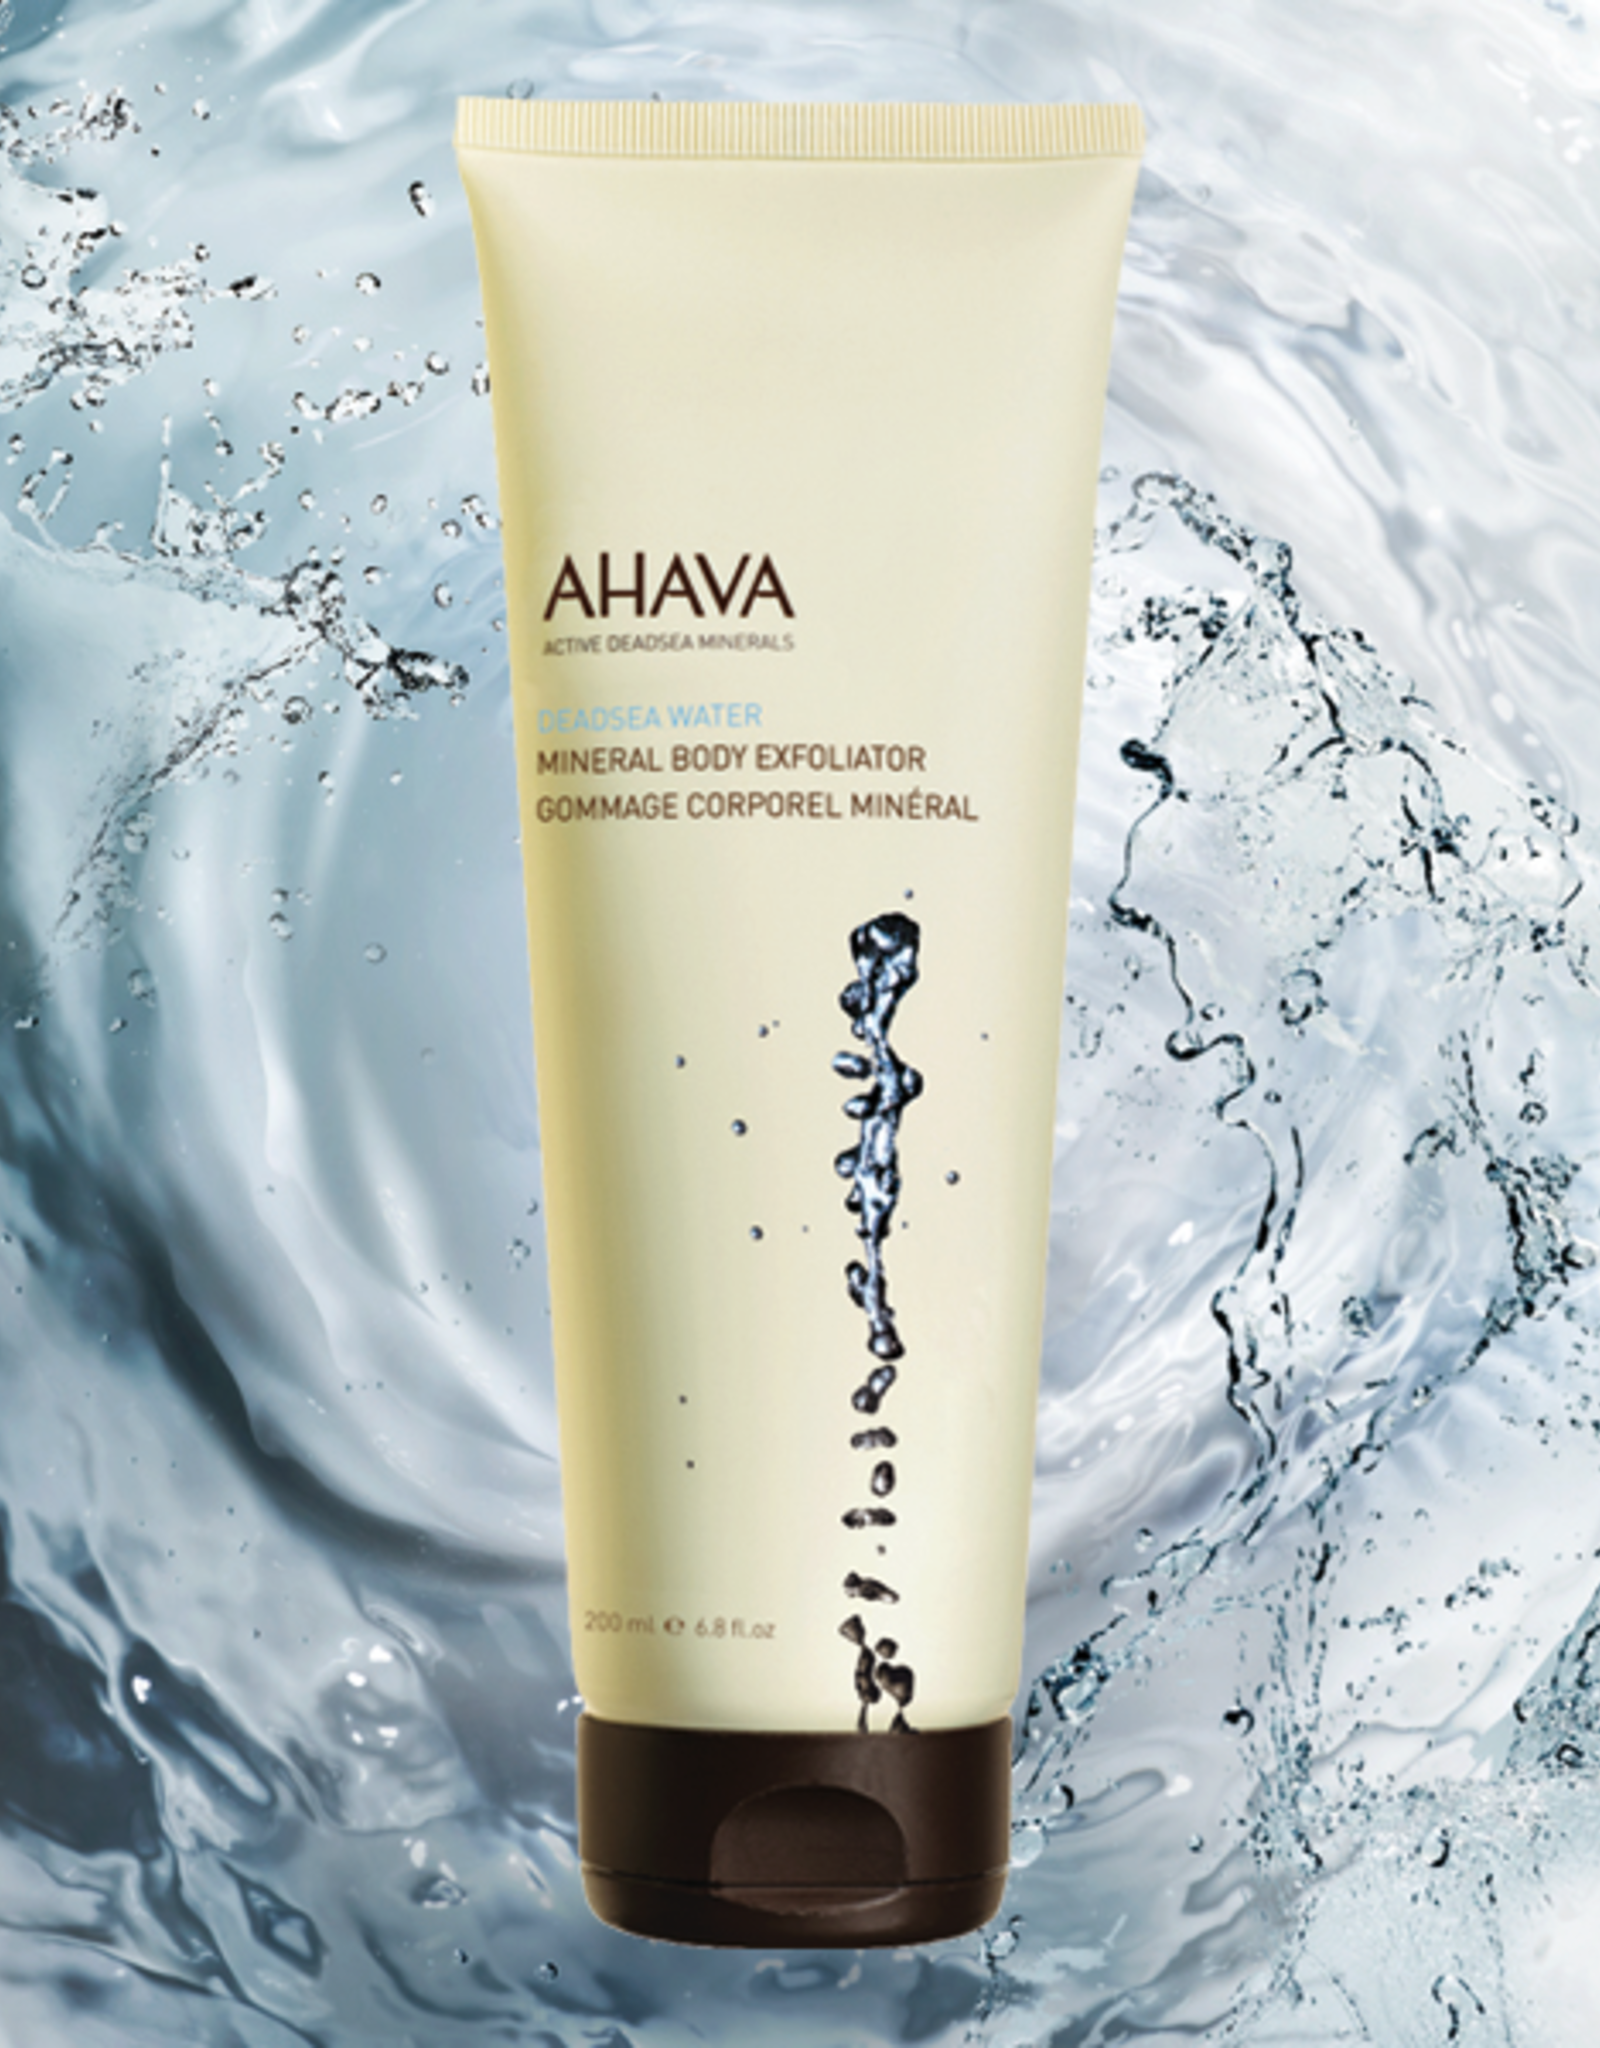 AHAVA mineral body exfoliator 200ml